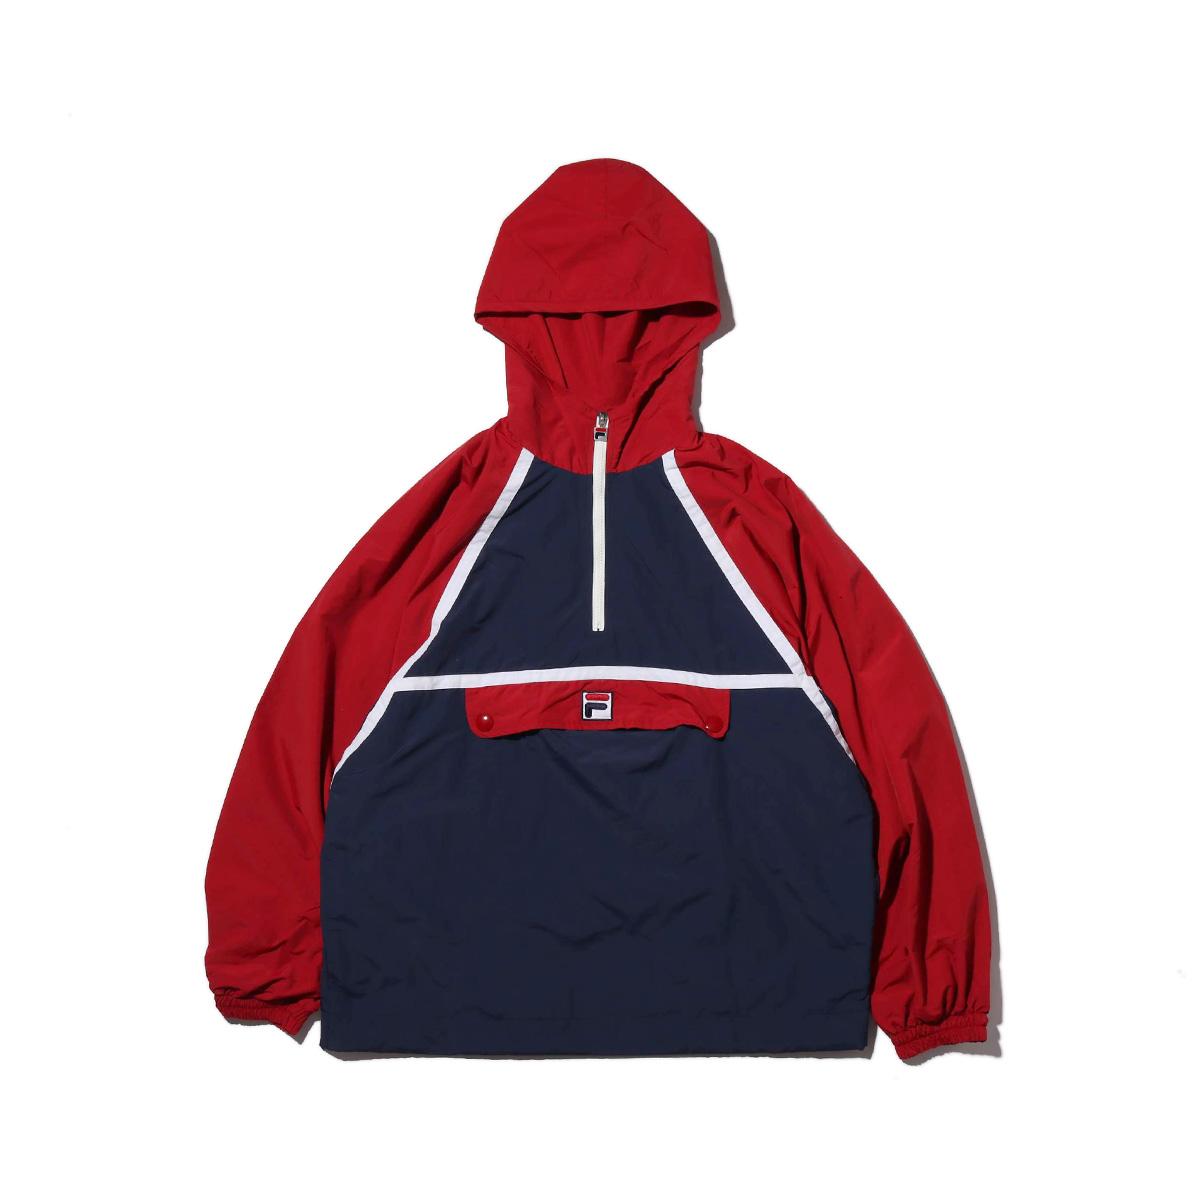 FILA Anorak (フィラ アノラック)RED【メンズ ジャケット】18FW-I